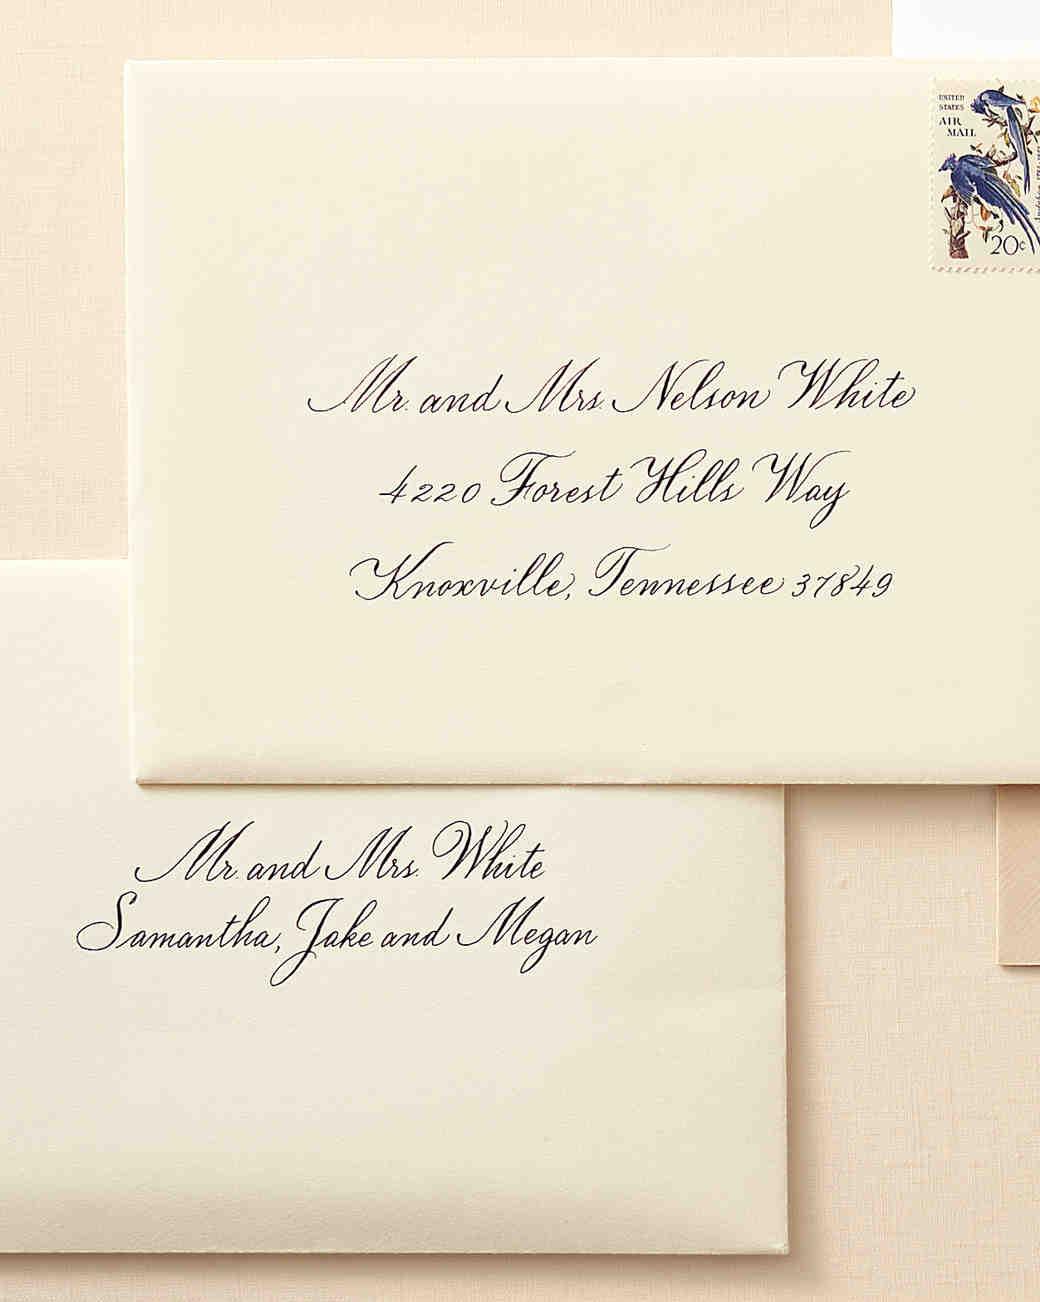 how to address wedding invitation envelopes wedding invitation envelopes To a Family With Children